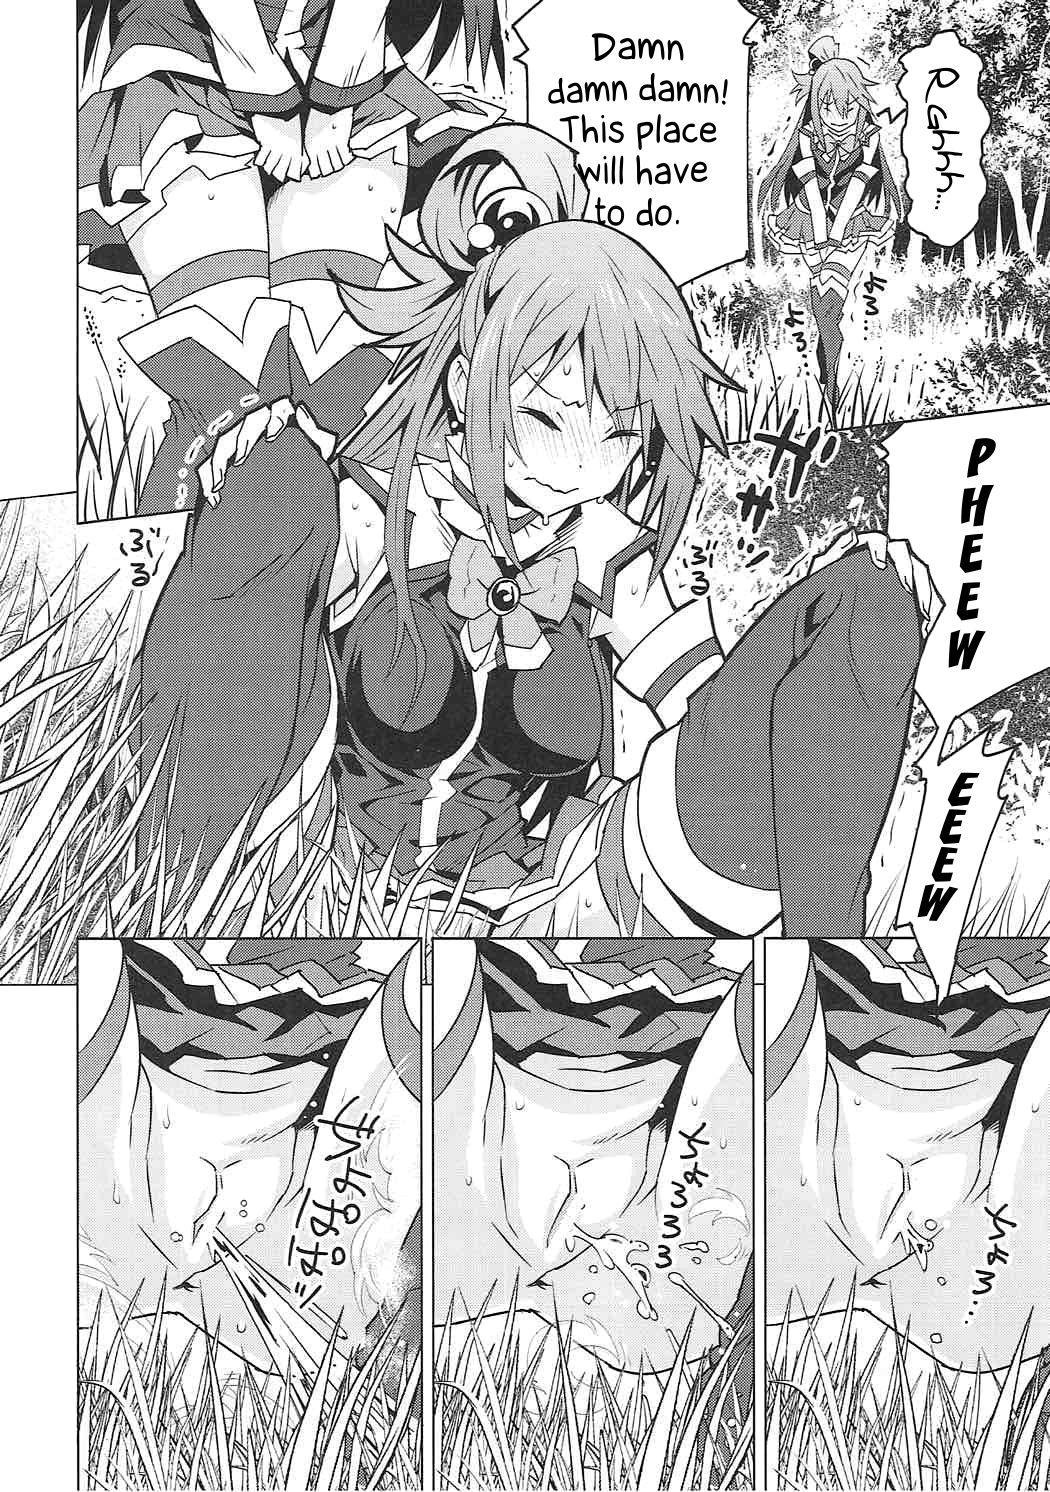 Kono Megami o Uneune Okasu Usui Hon | A thin book where this goddess gets ravished sinuously 2